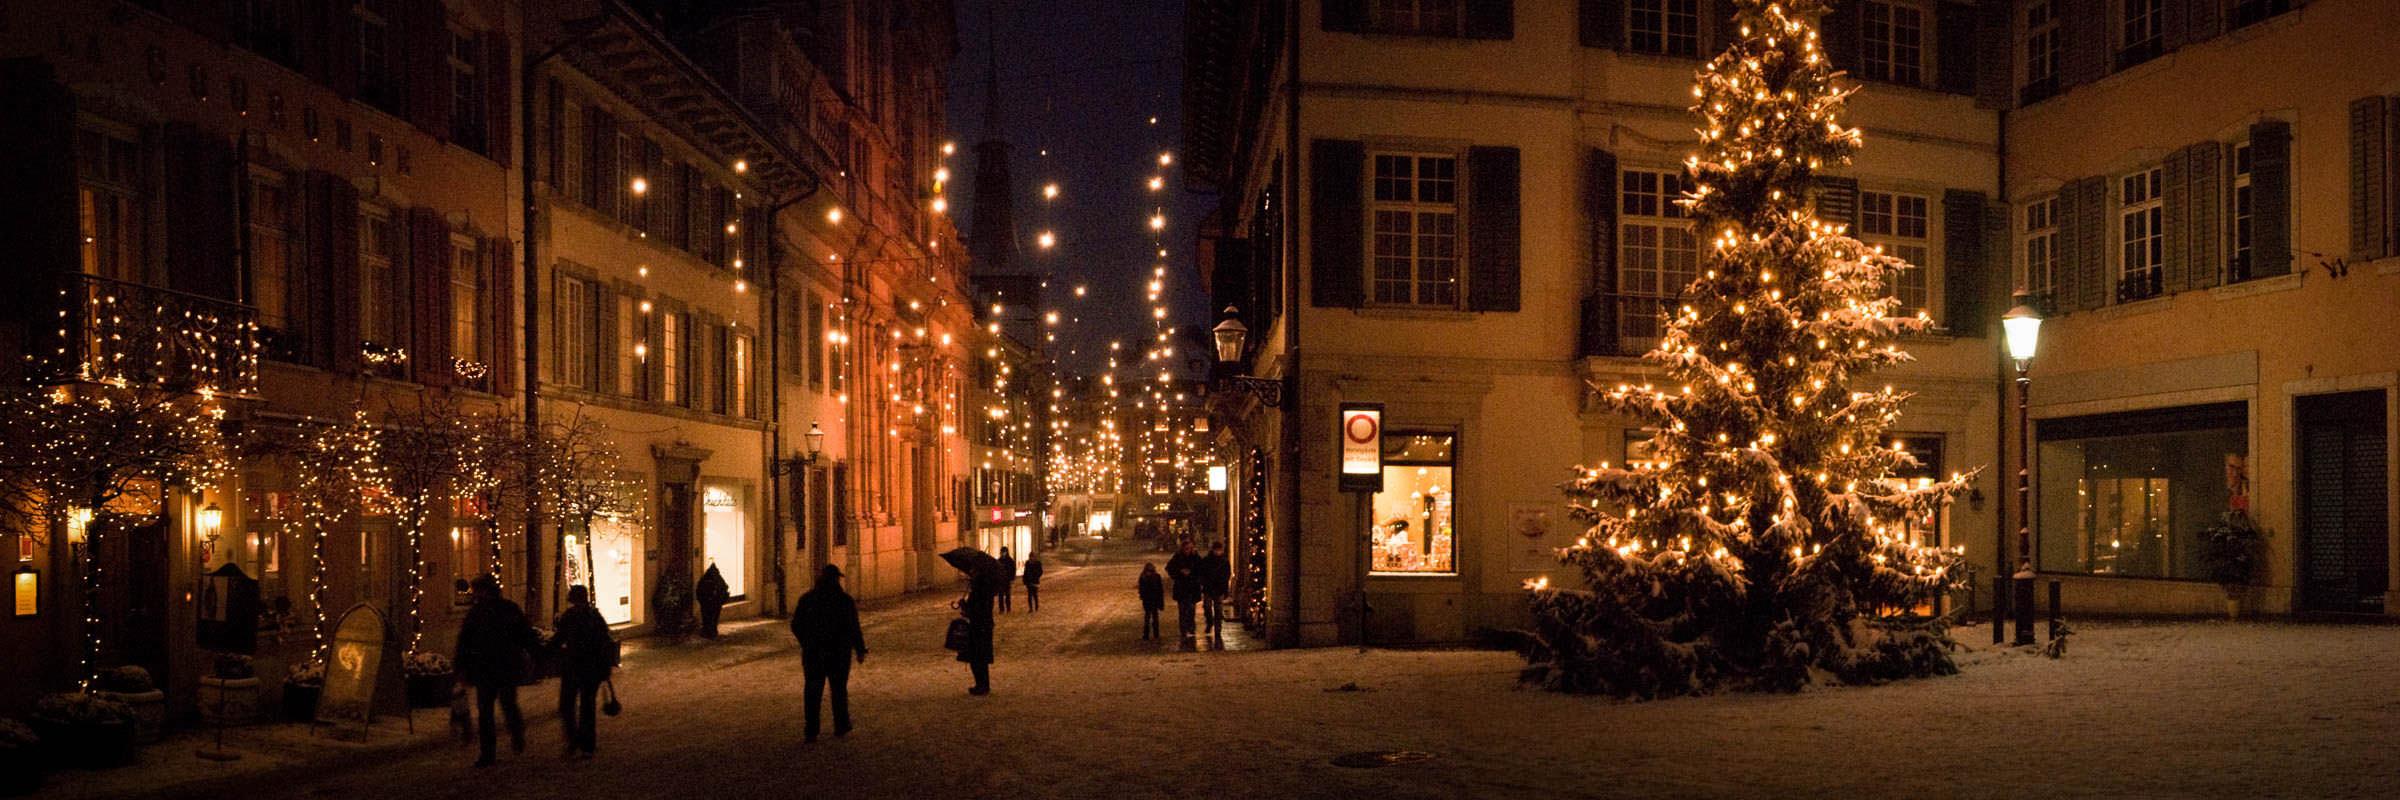 Solothurn, Switzerland